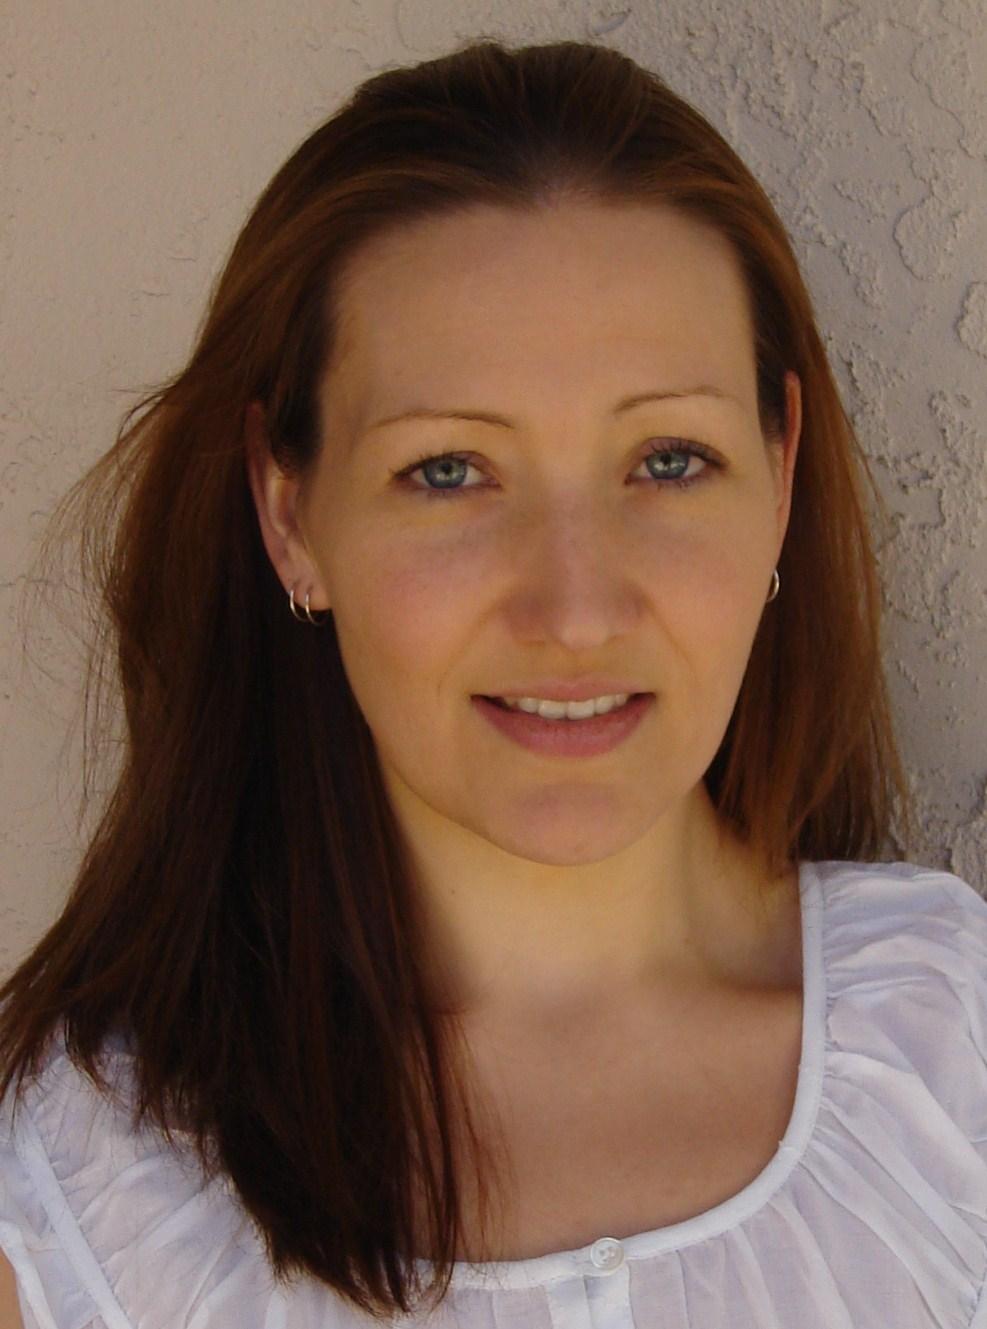 Lisa Perry